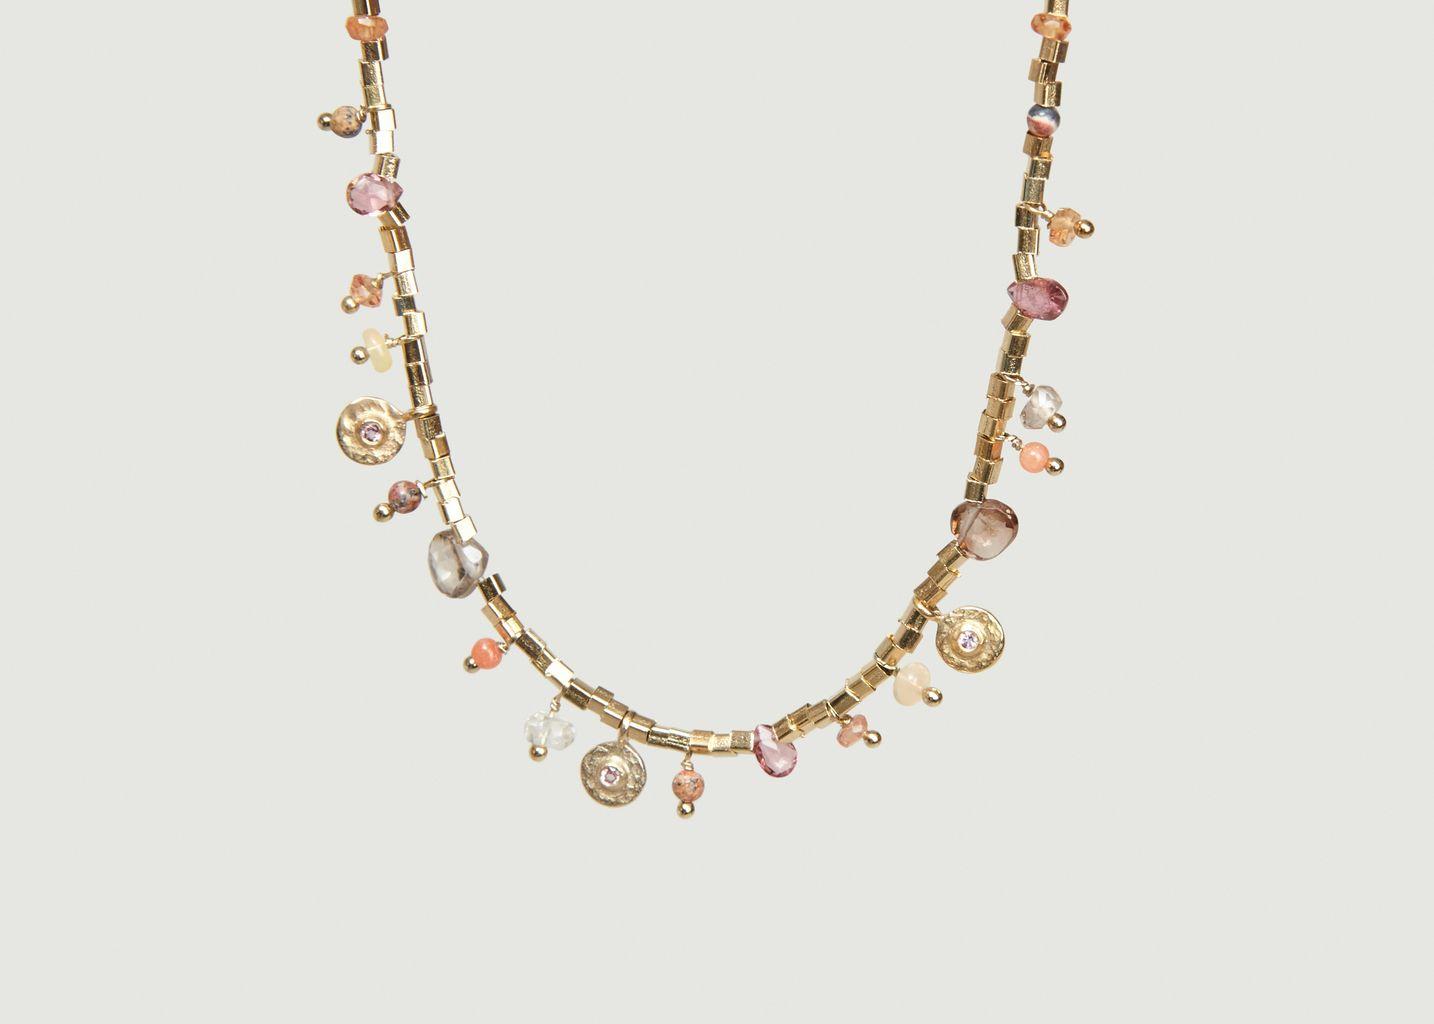 Collier Asia Tourmaline Rose - 5 Octobre